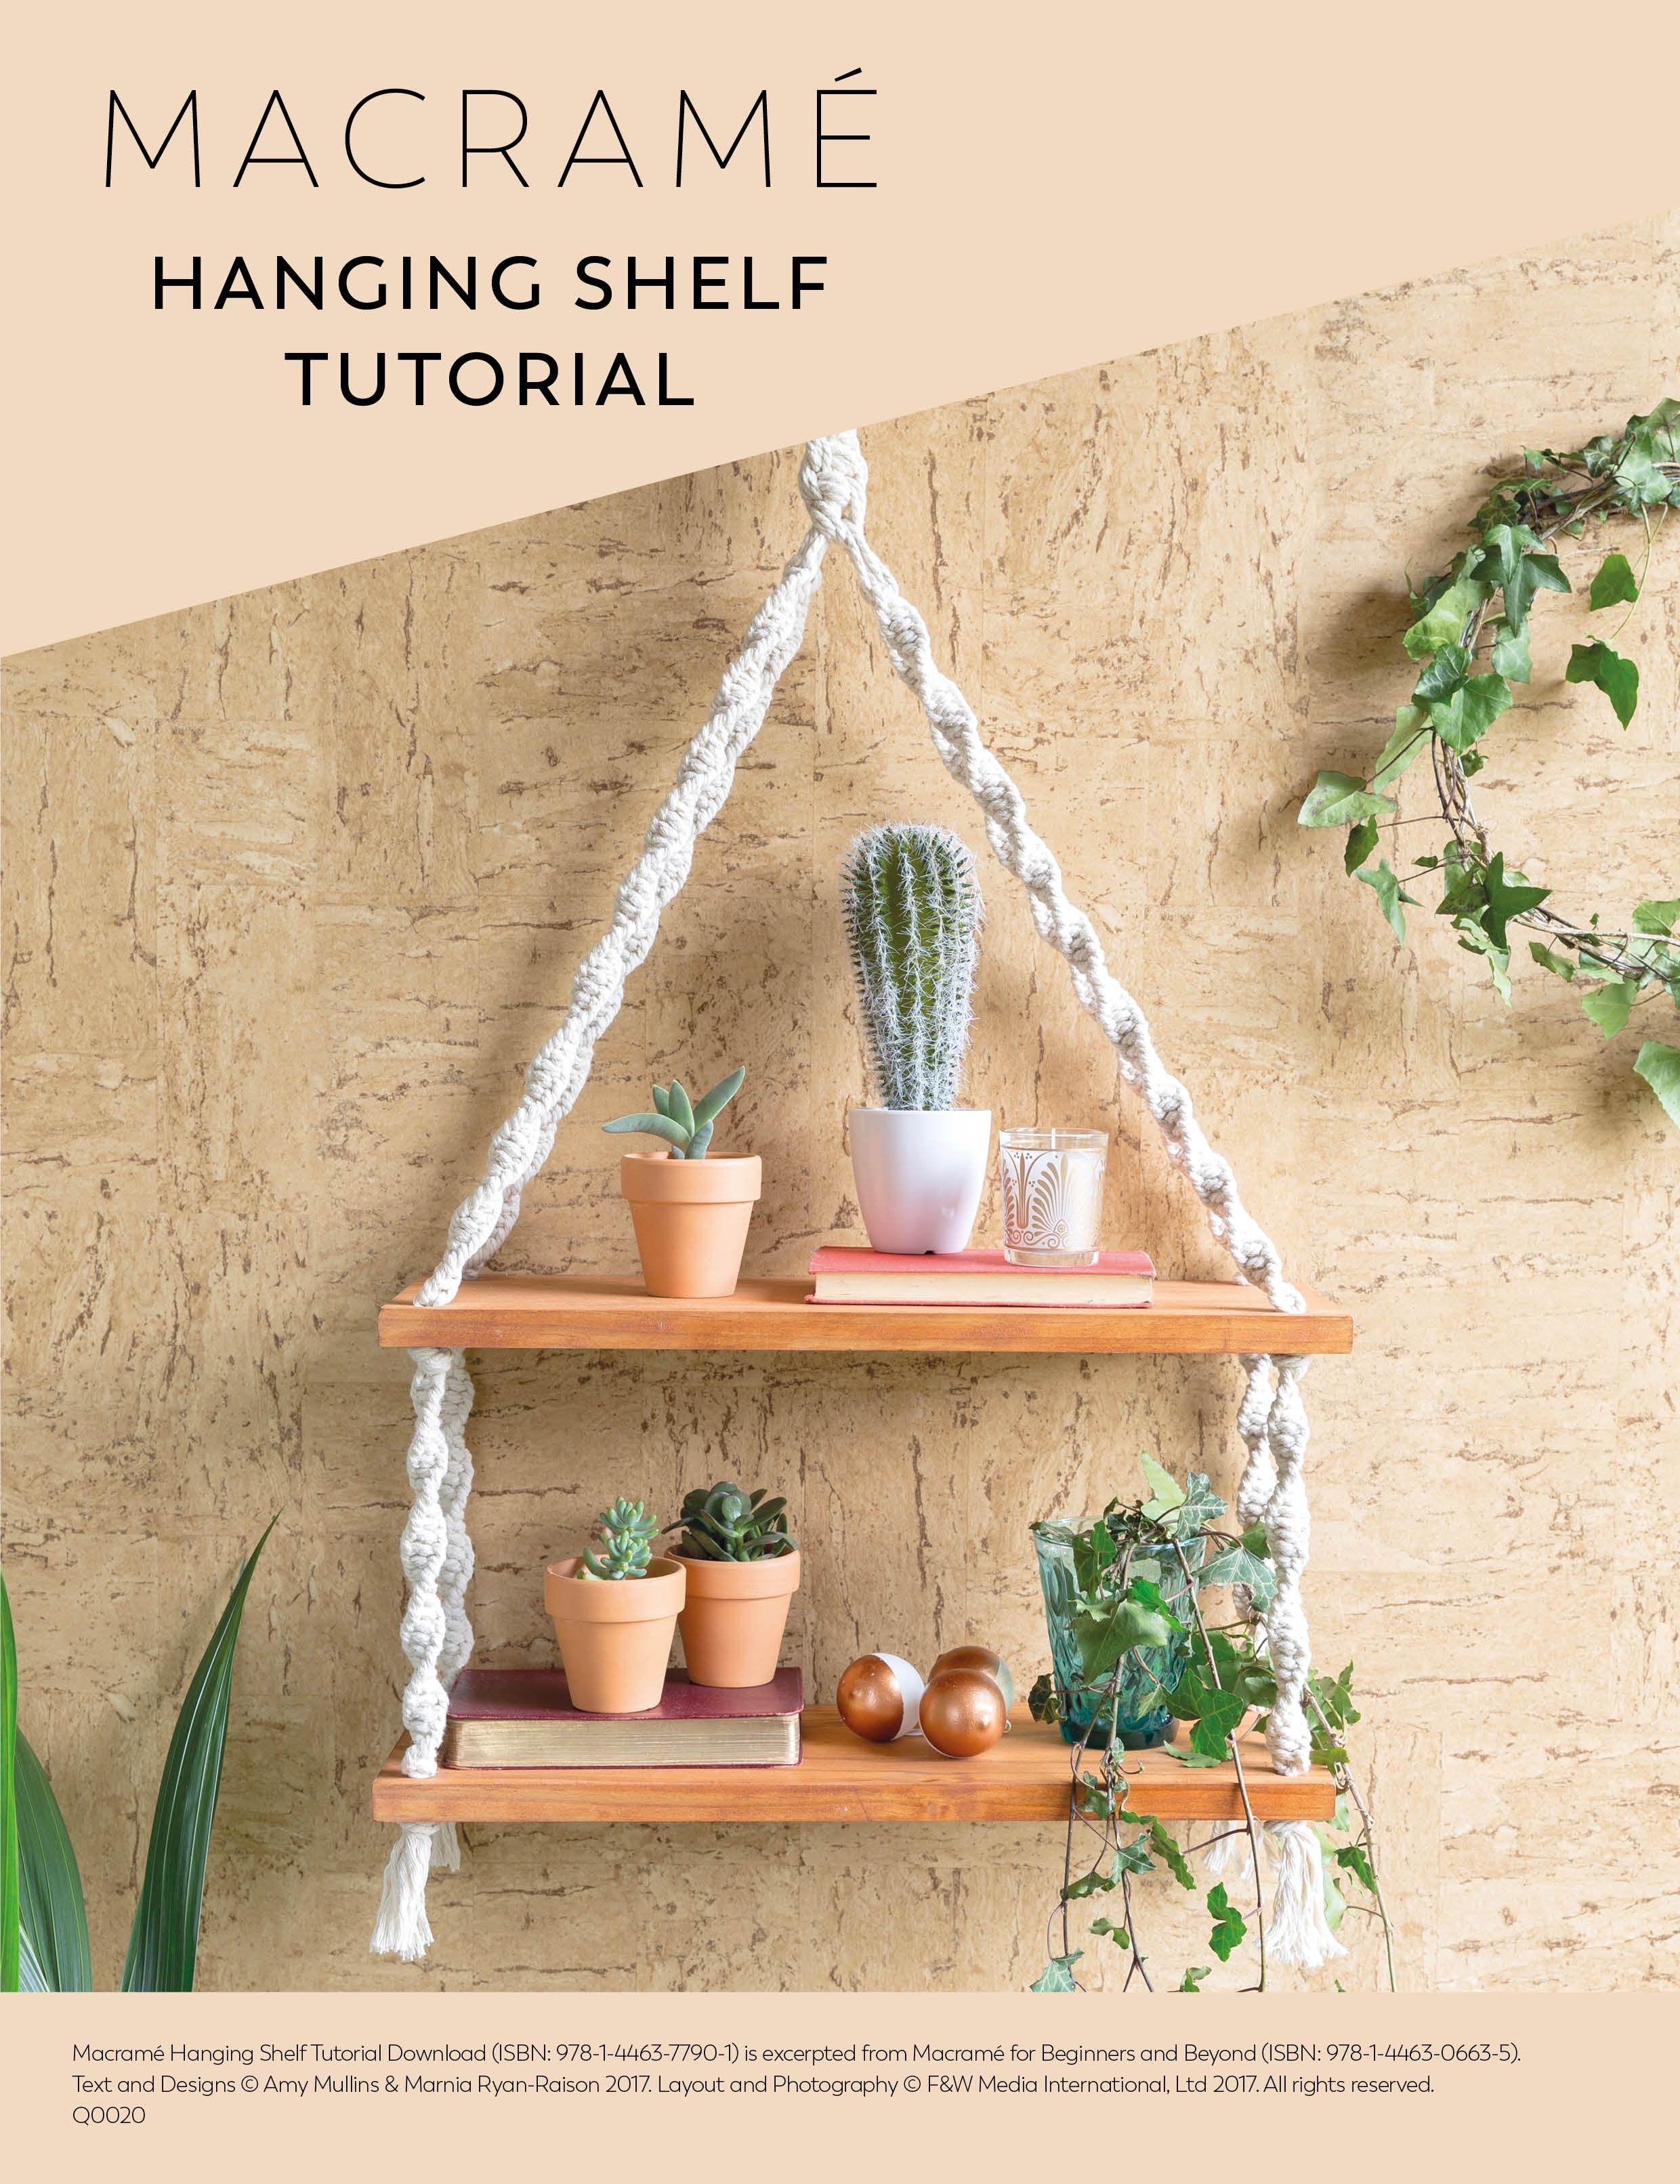 Create impressive unique macrame hanging shelves with